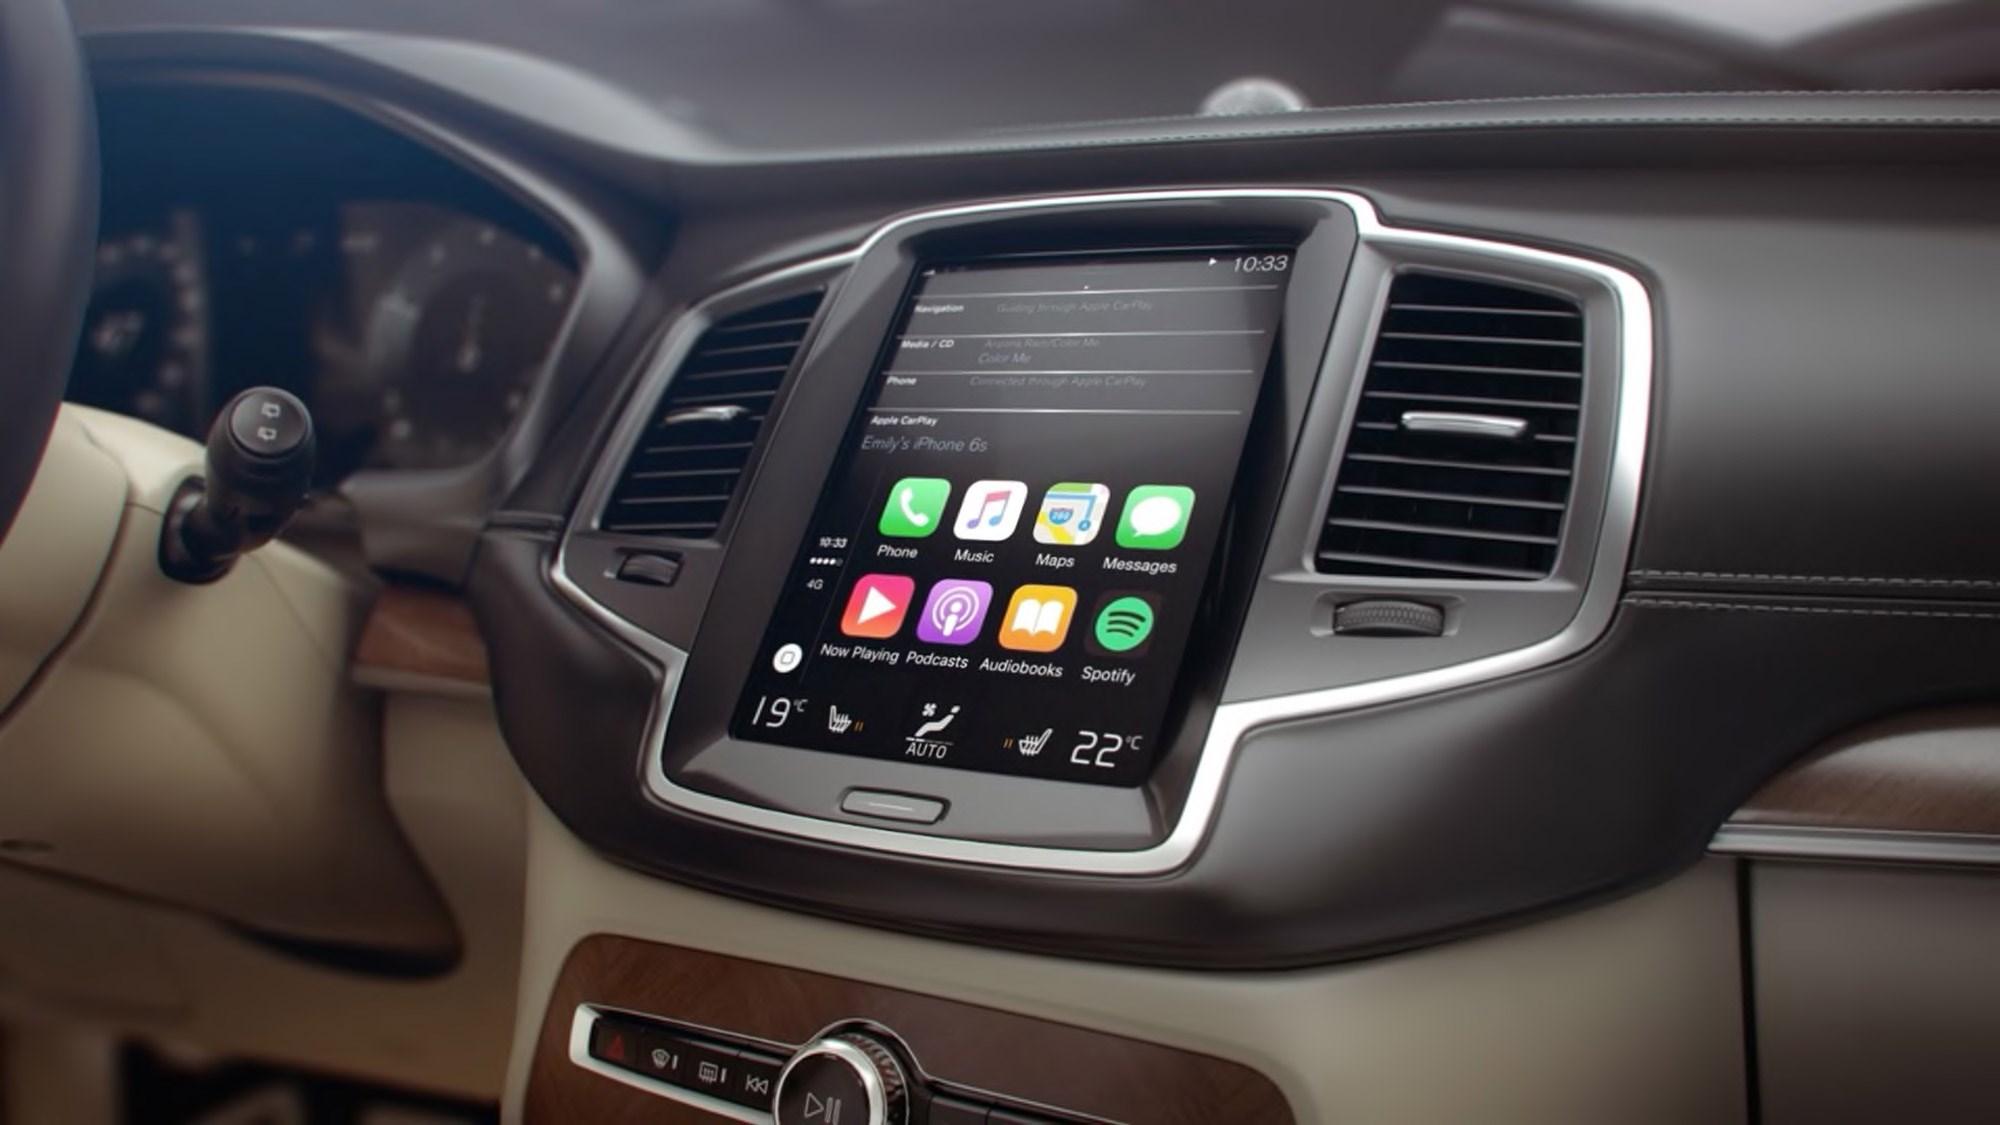 Apple Carplay Ios 12 Adds Google Maps Support Car Magazine